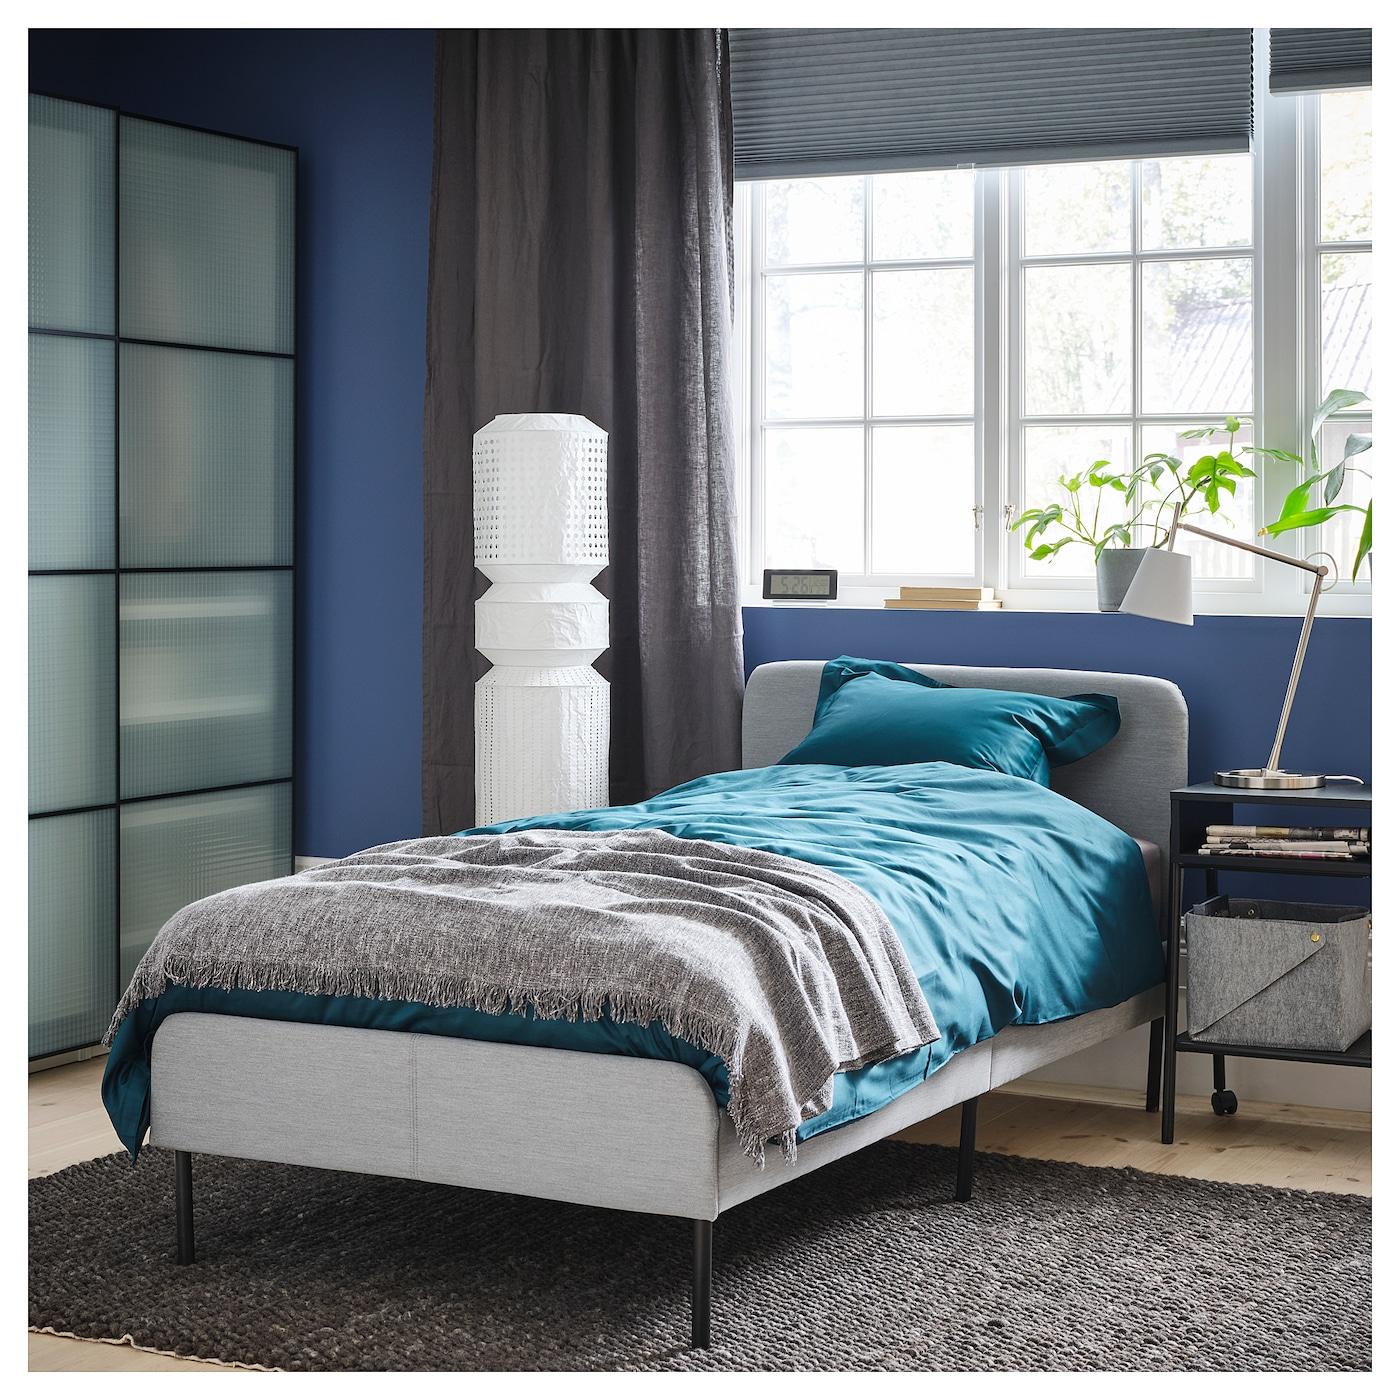 Slattum Upholstered Bed Frame Knisa Light Grey 90x200 Cm Ikea